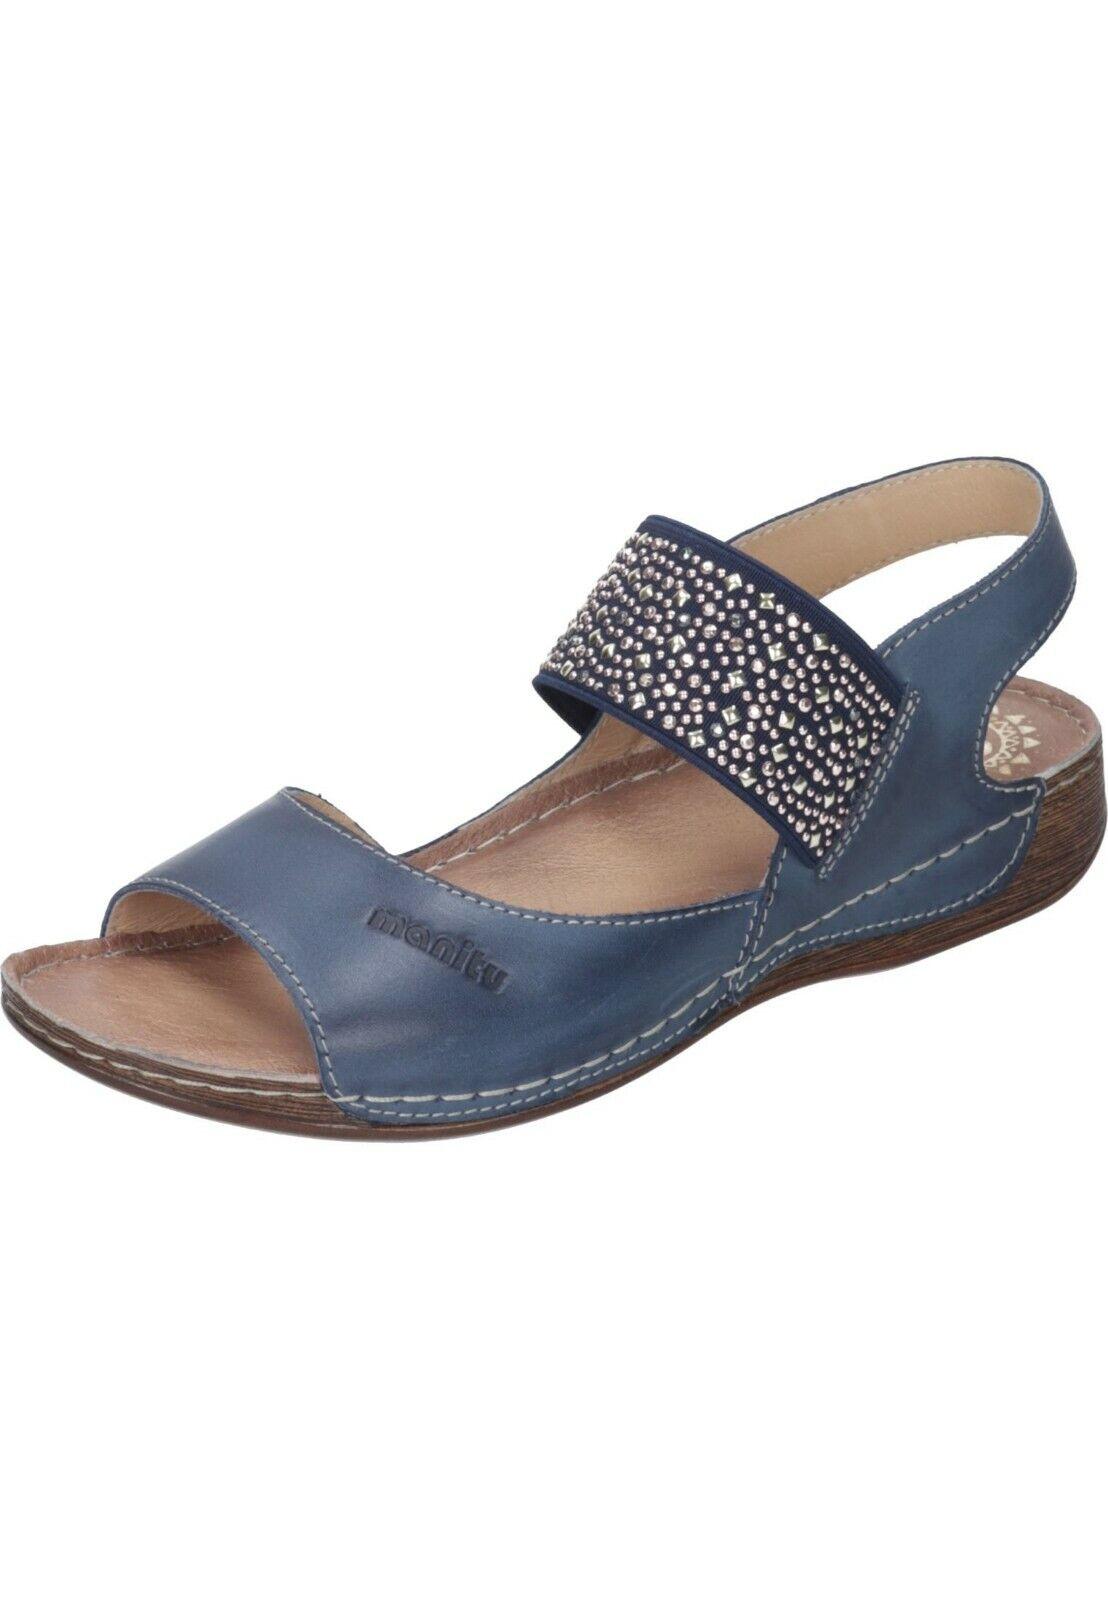 Manitu Sandals Sandals Leather Womens shoes bluee 36 - 41 910847 -5 Neu6